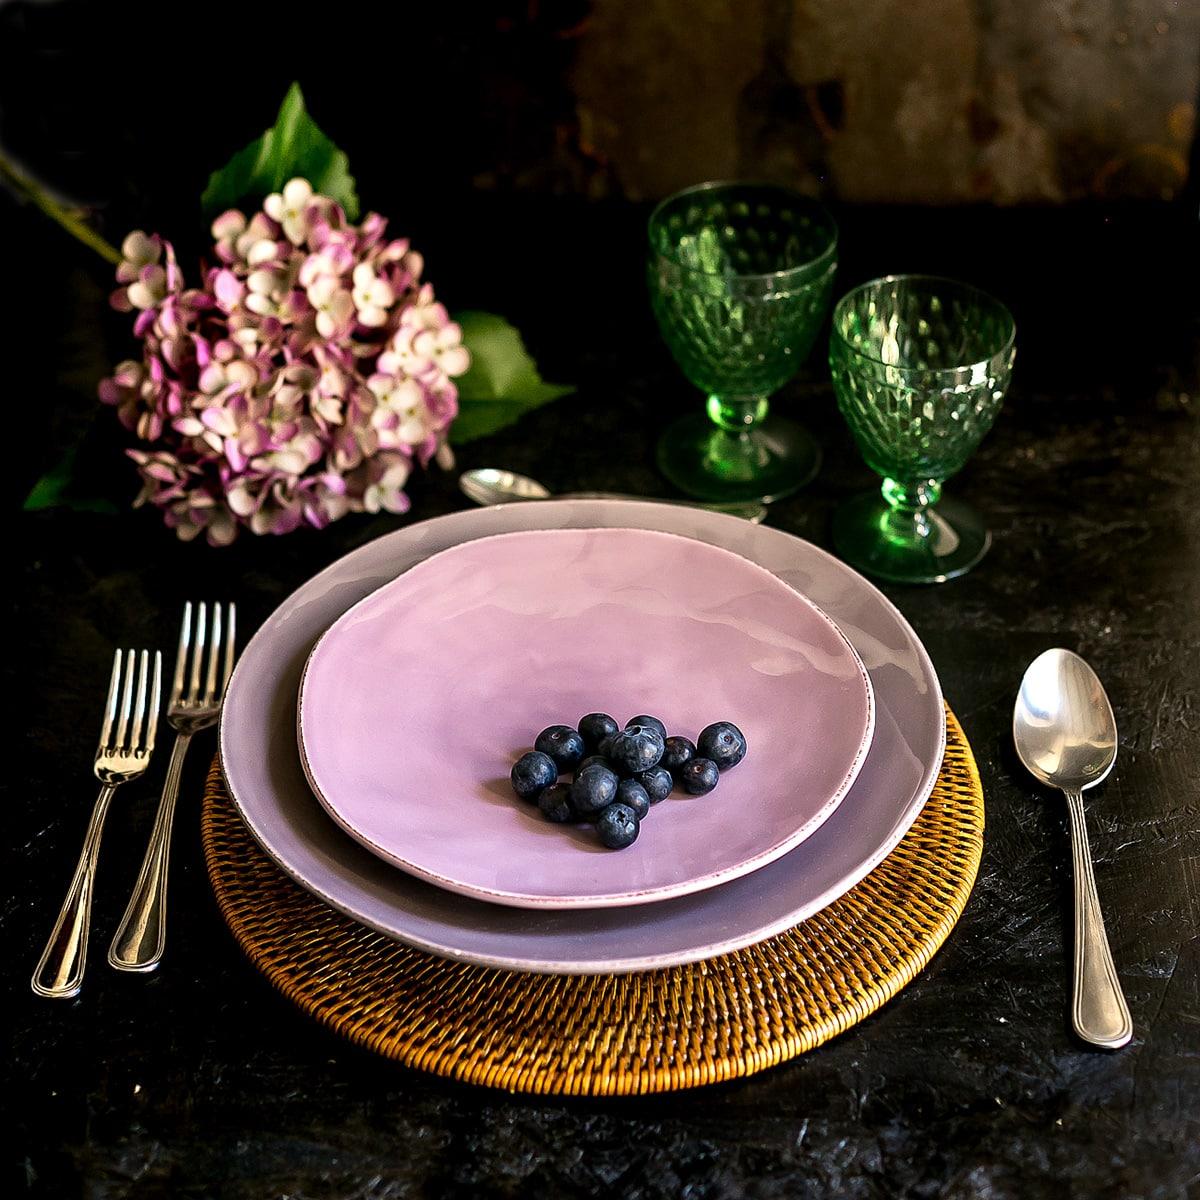 come-apparecchiare-la-tavola-regole-regole-galateo-lifestyle-contemporaneo-food